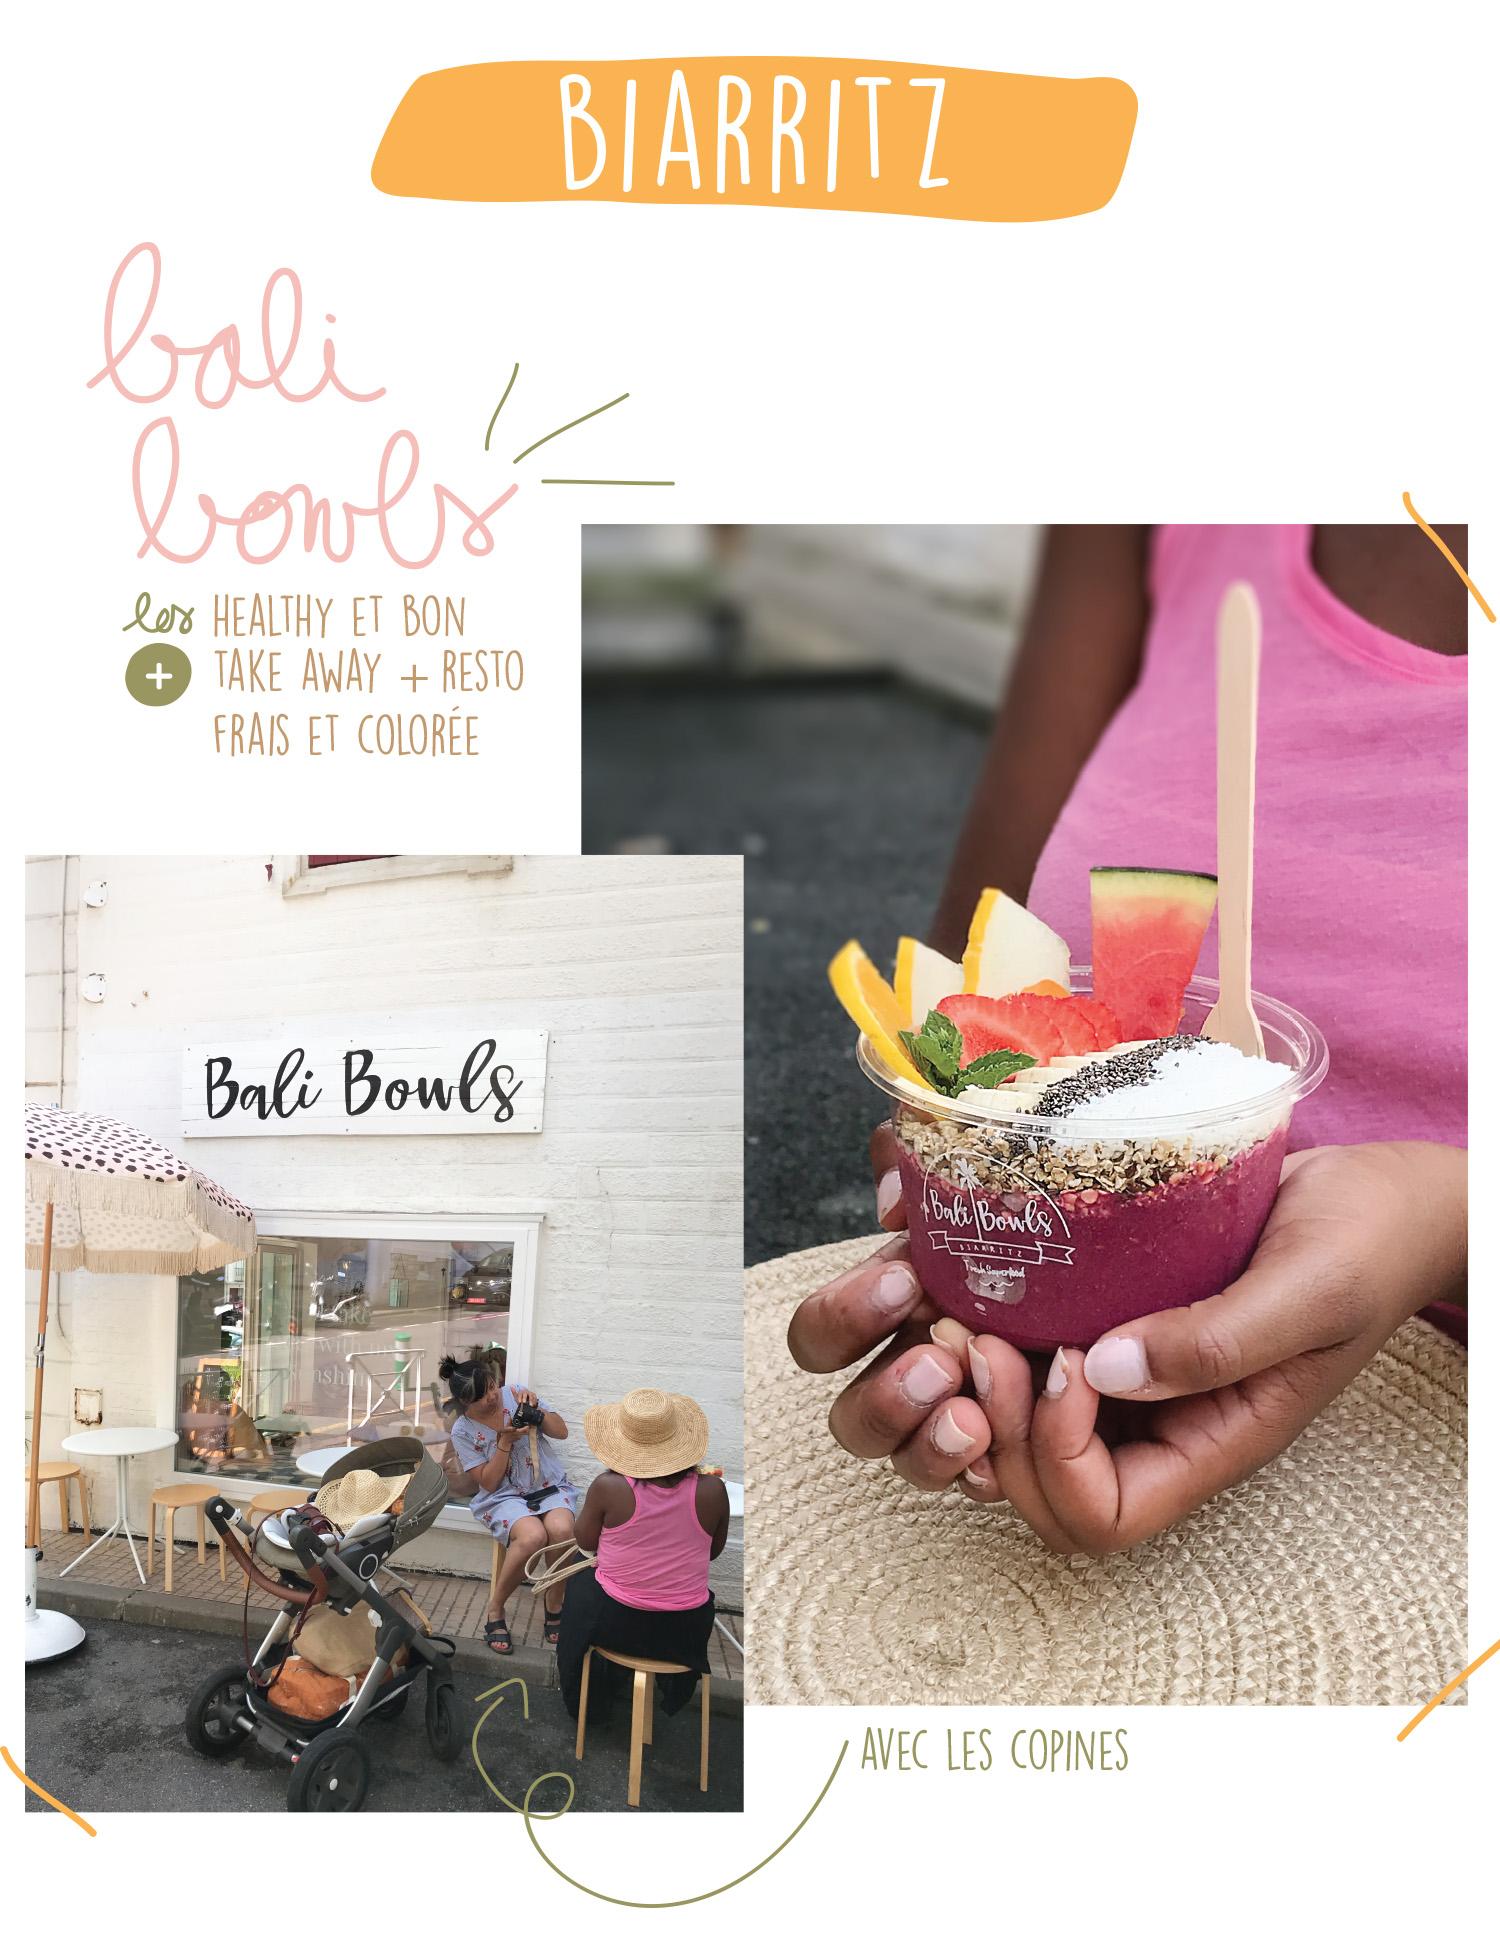 Bonne Adresse Biarritz - Bali Bowls - Petits Béguins